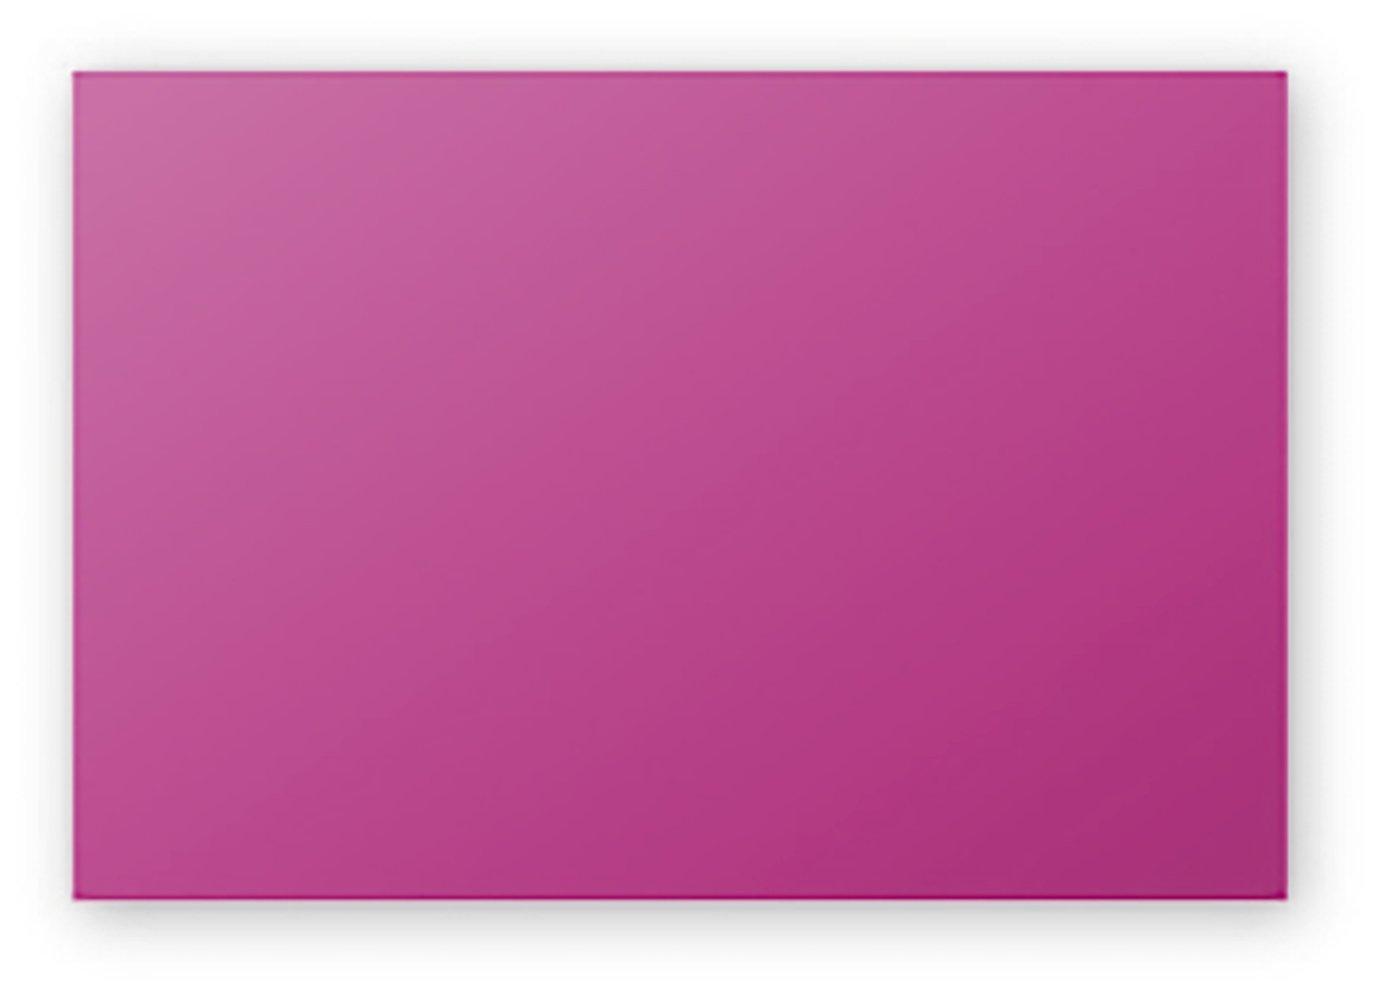 21 x 29 DIN A4 Himbeerrosa 7cm Clairefontaine 224206C Packung mit 25 Karten Pollen 210g